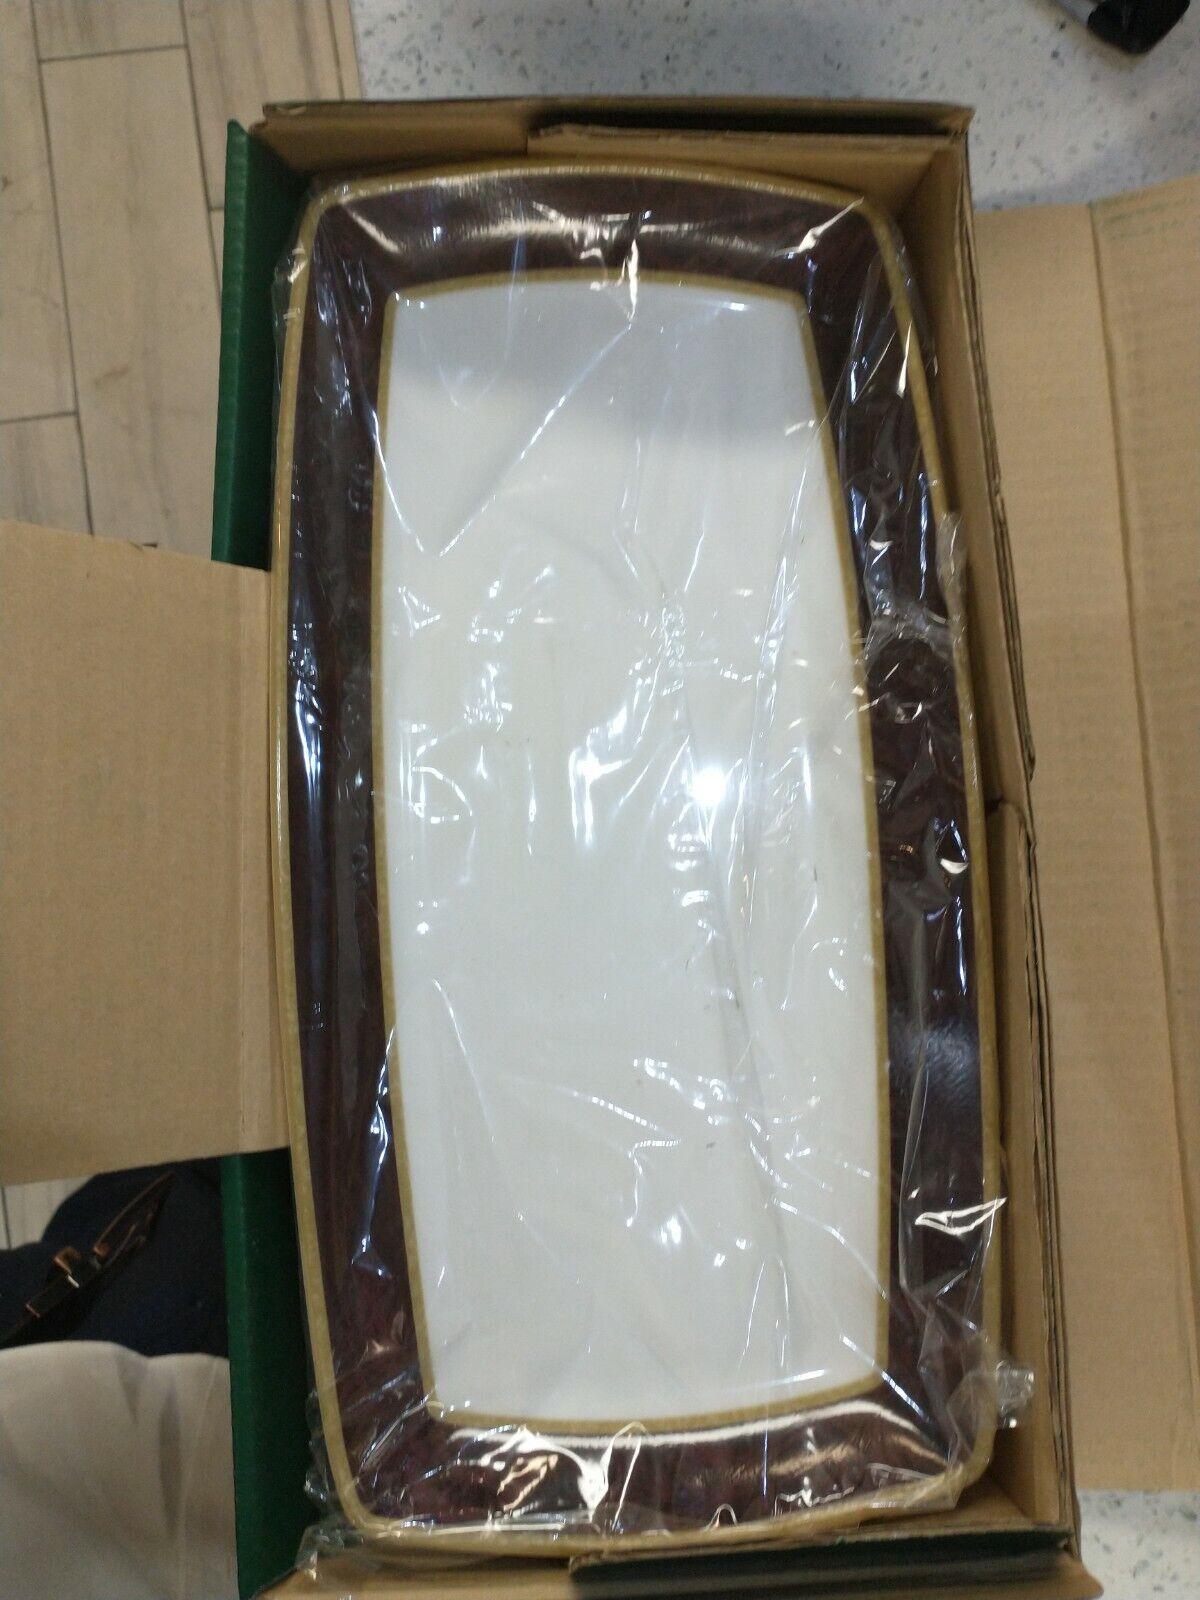 Noritake Mahogany Rose Rectangular Platter 14.25 NEW WITH TAGS Bone China - $34.99